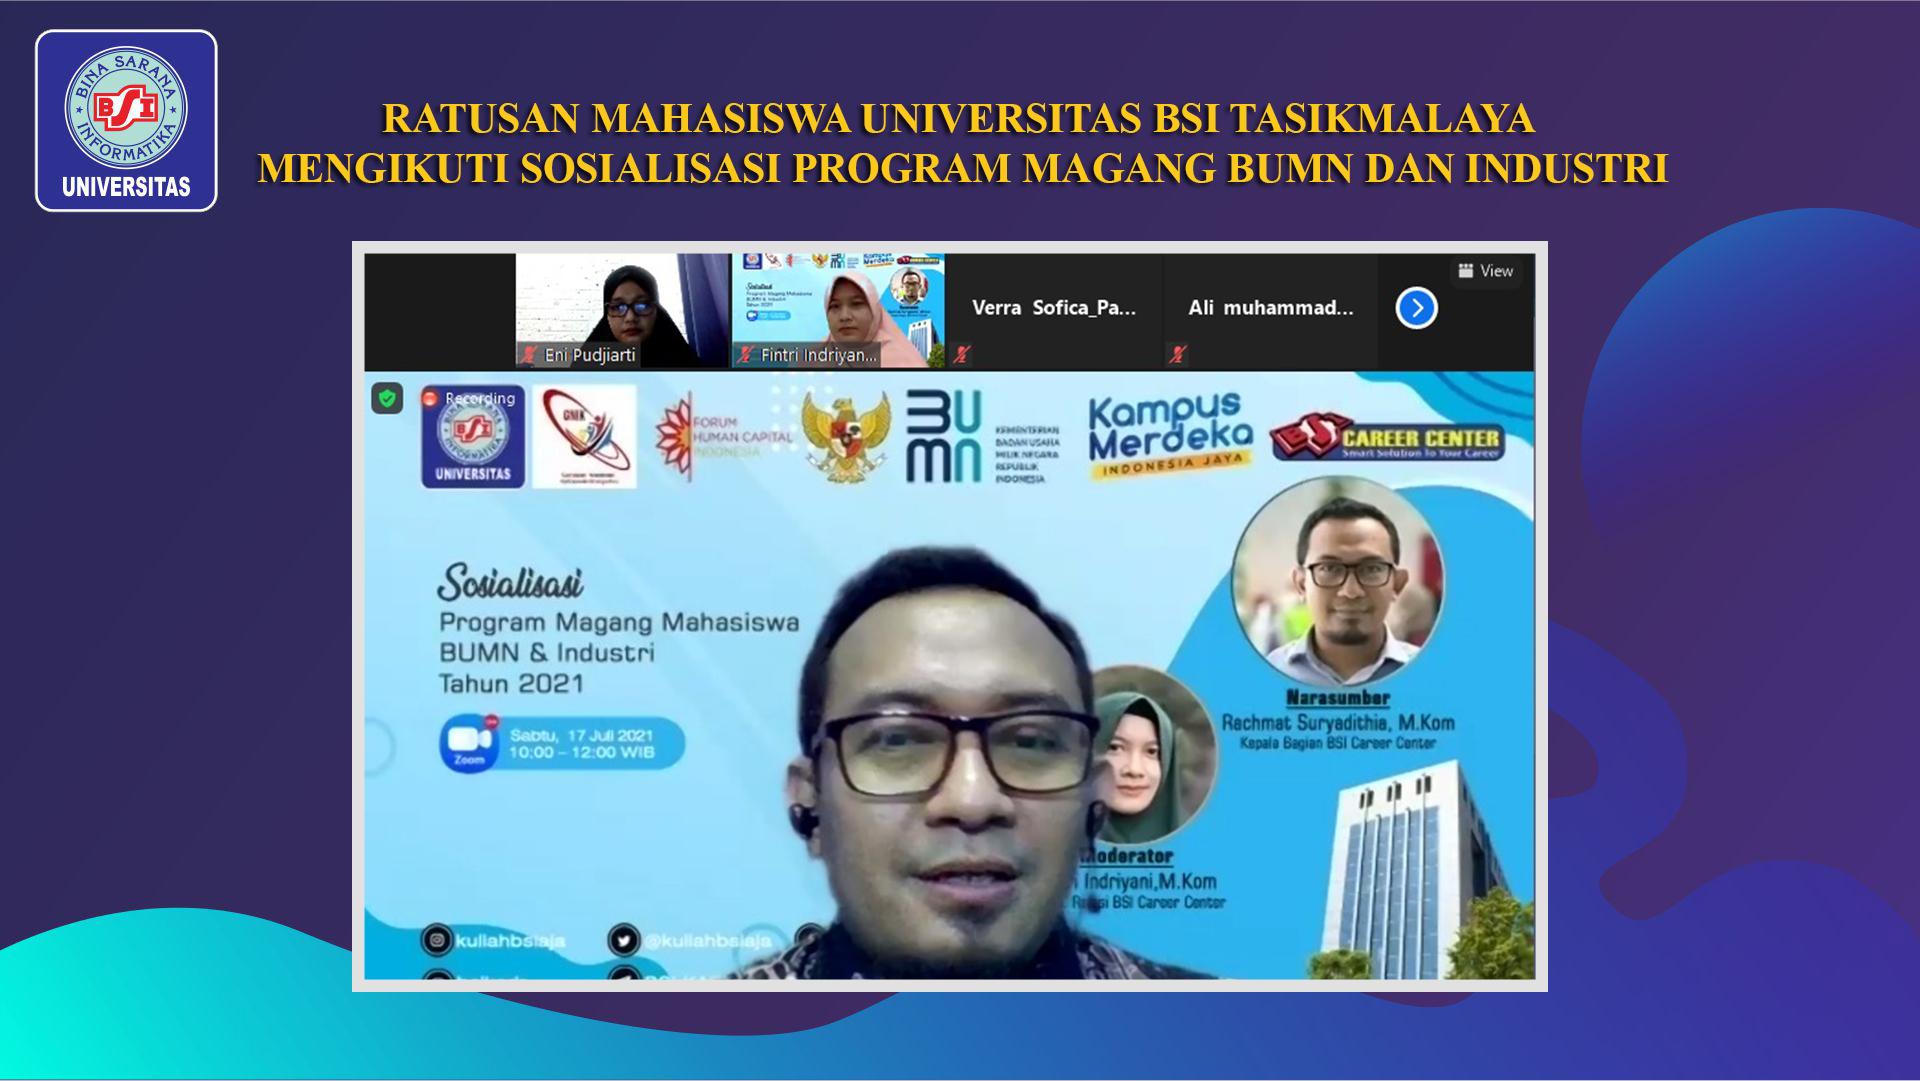 RATUSAN MAHASISWA UNIVERSITAS BSI TASIKMALAYA MENGIKUTI SOSIALISASI PROGRAM MAGANG BUMN DAN INDUSTRI